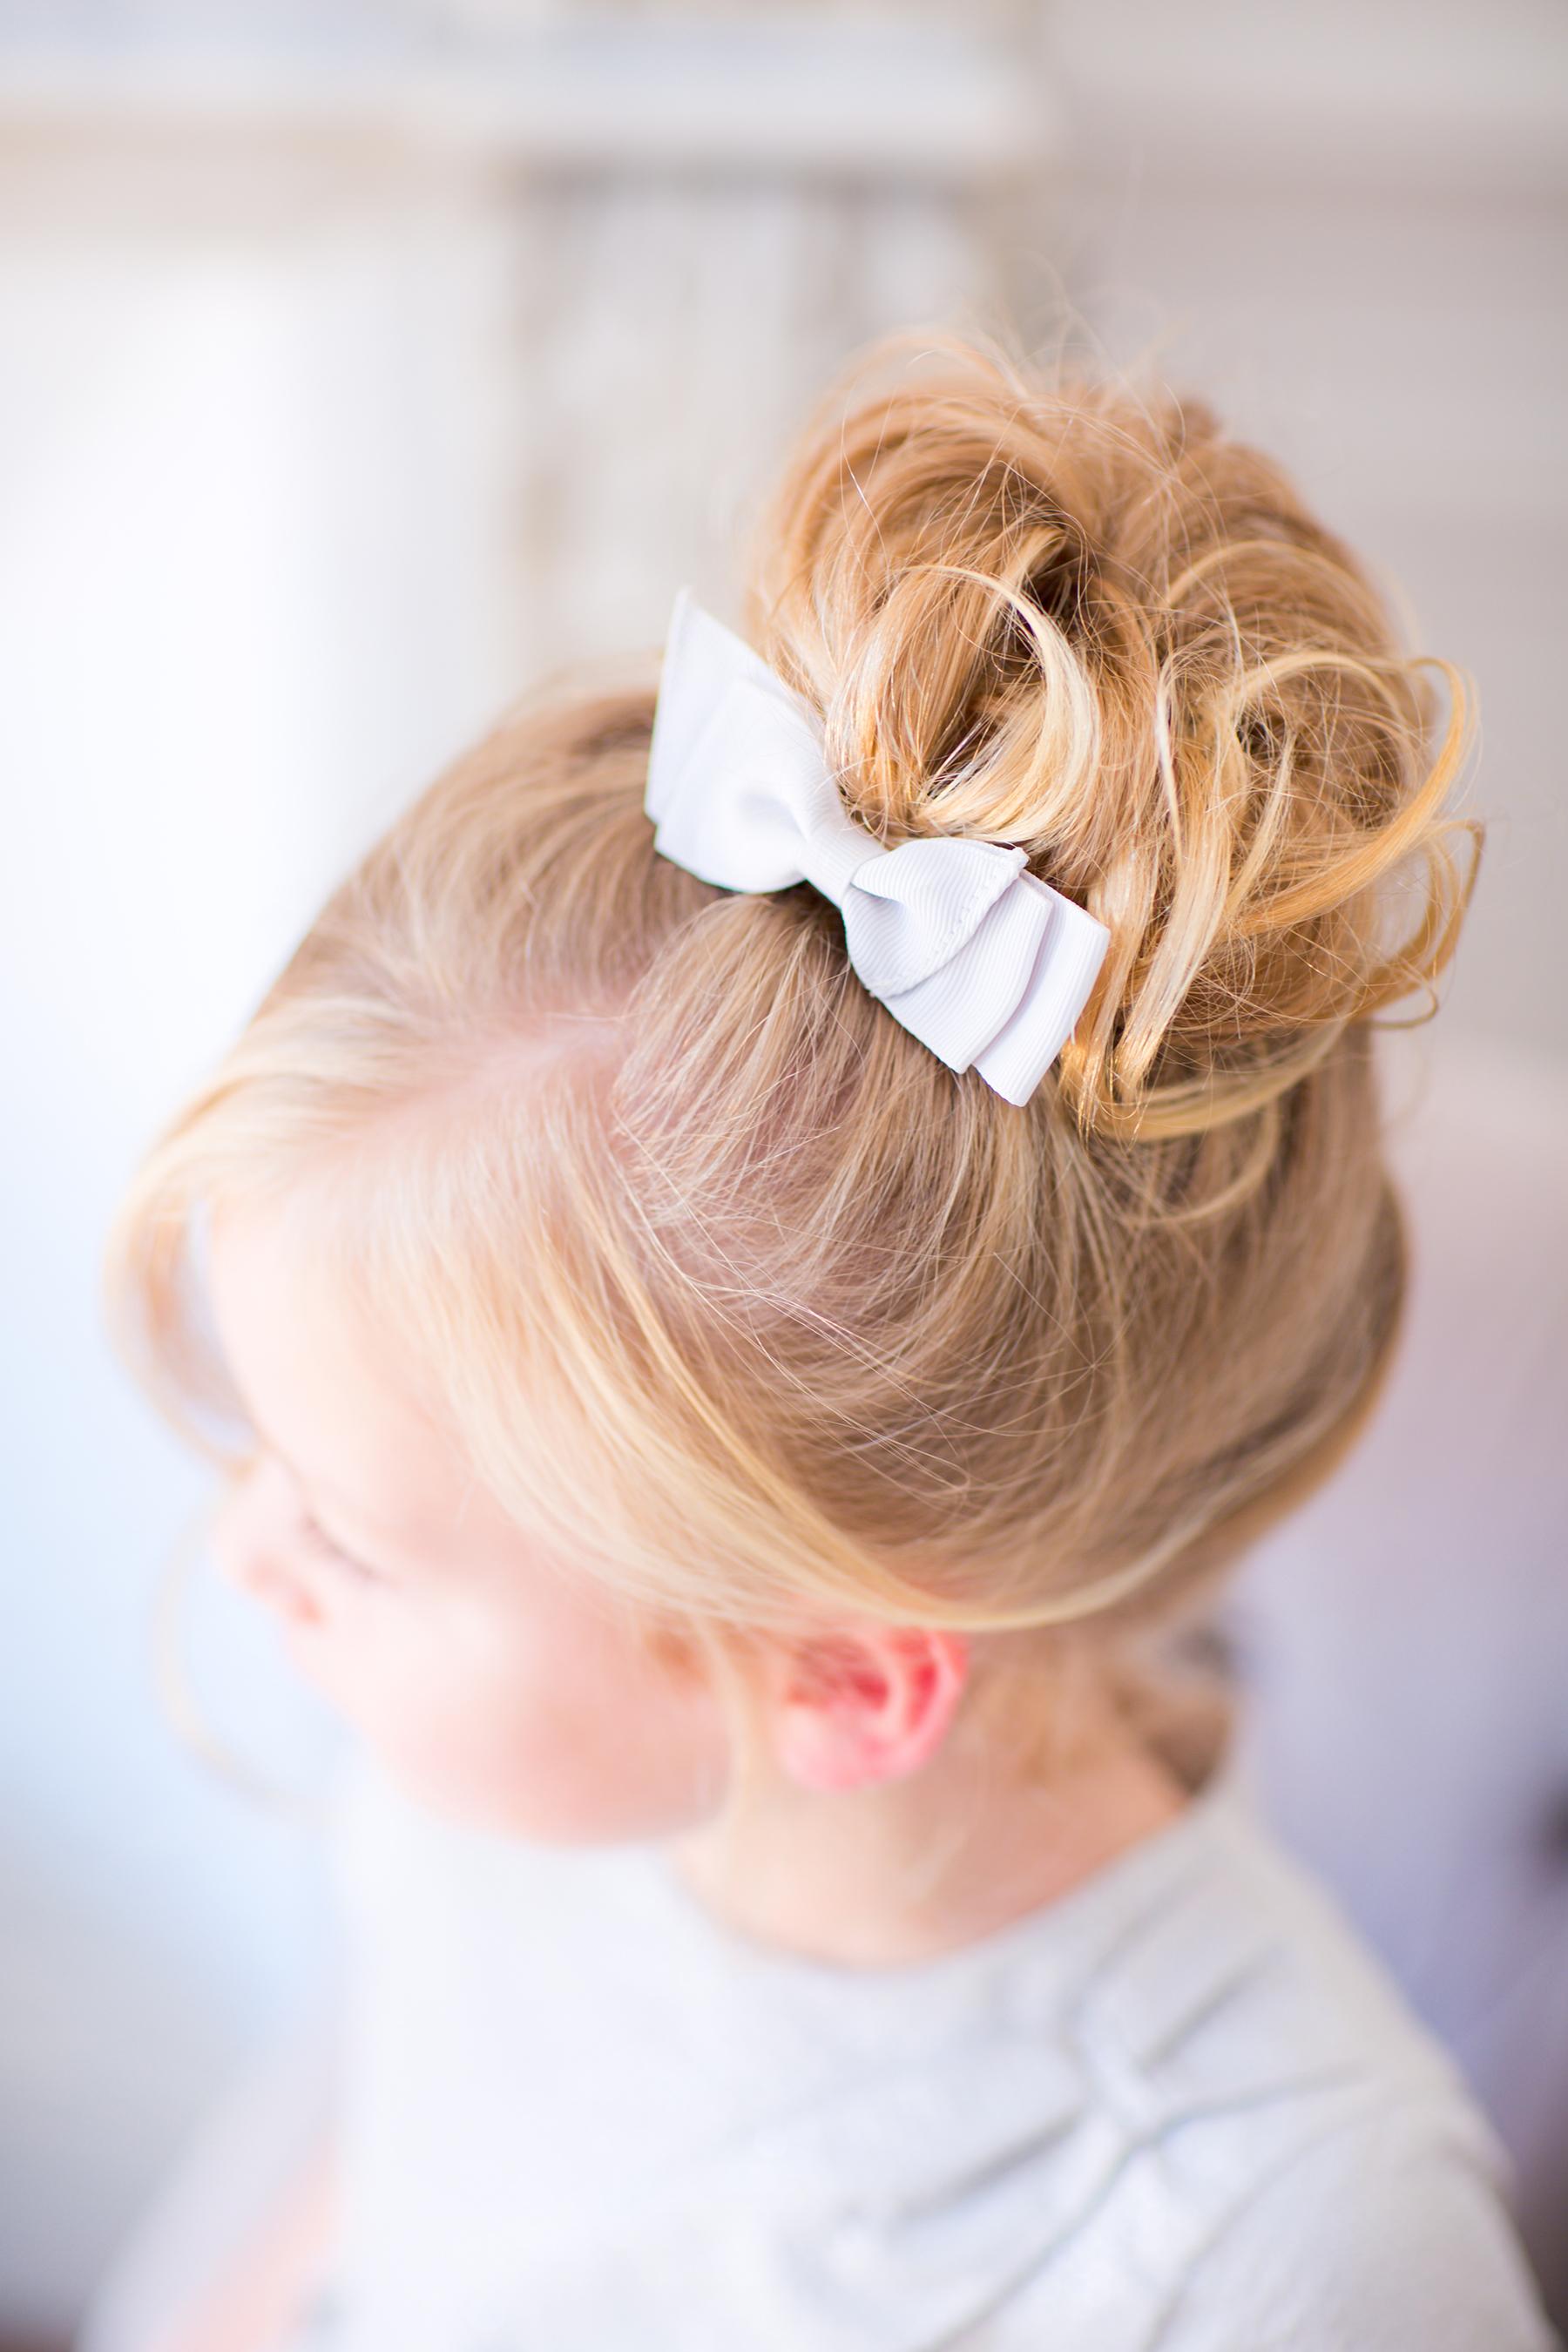 Flower Girl Bun Hairstyle High Curly Bun with Bow